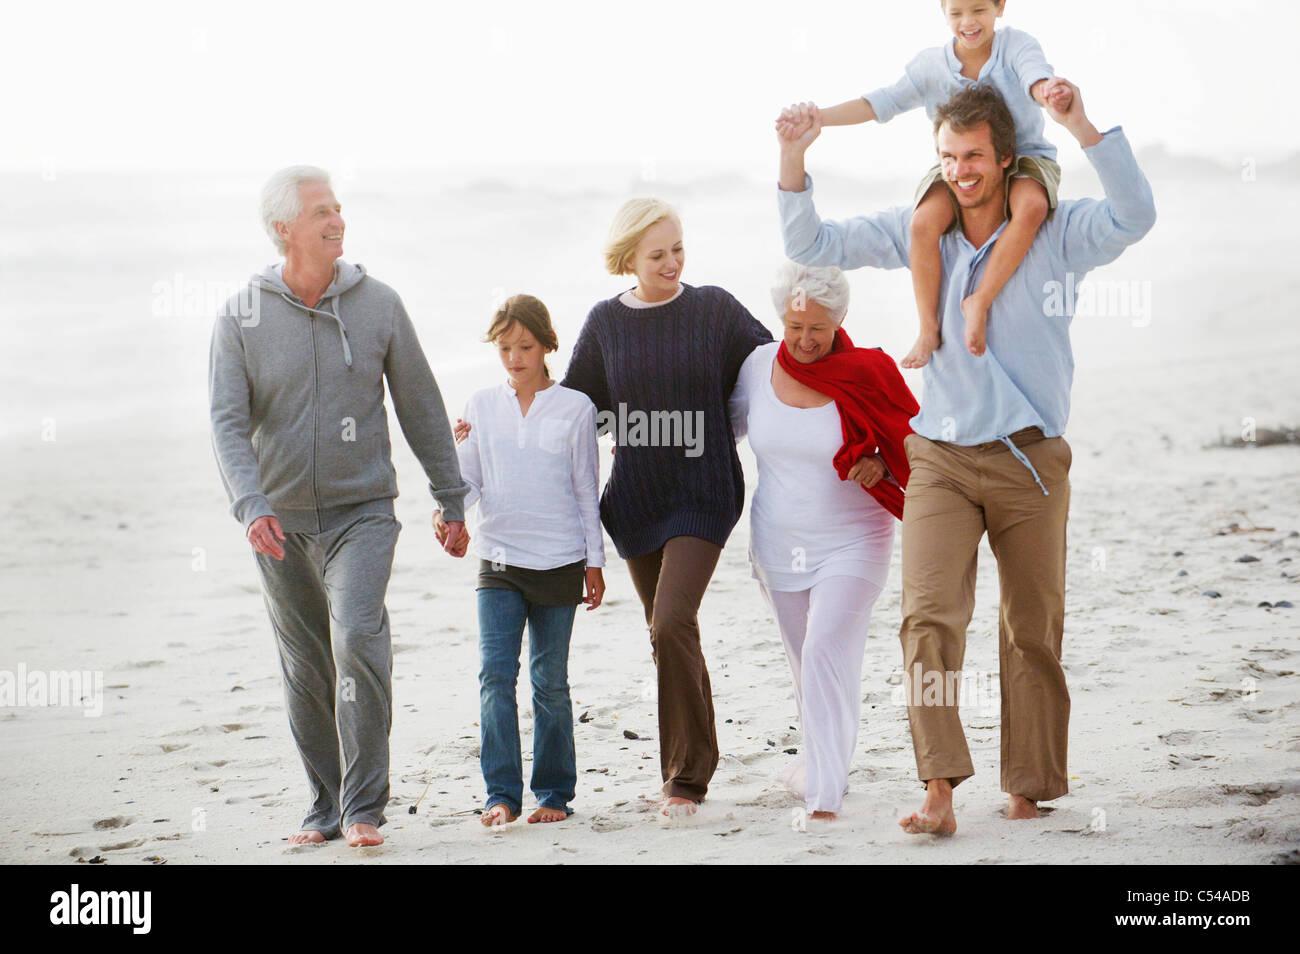 Multi-generation family walking on the beach Photo Stock